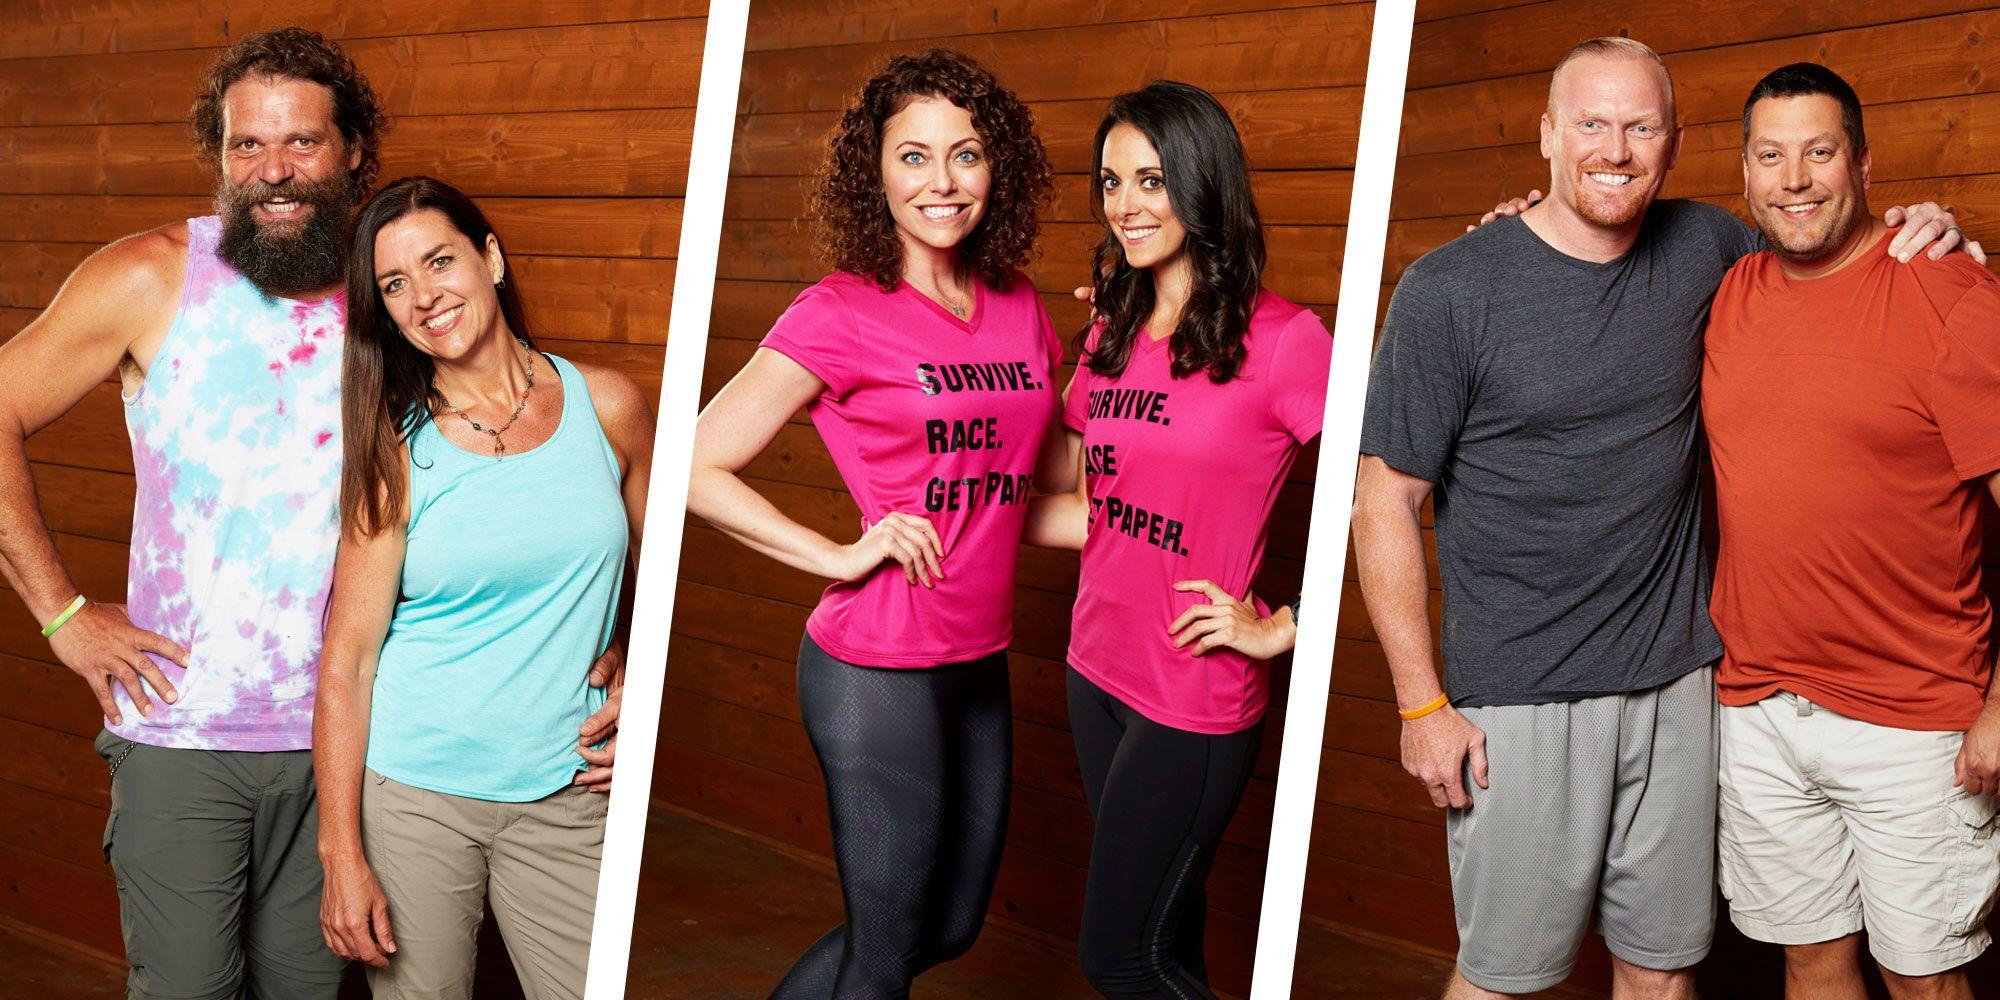 Meet the 6 Survivor Contestants Battling It Out on The Amazing Race Season 31